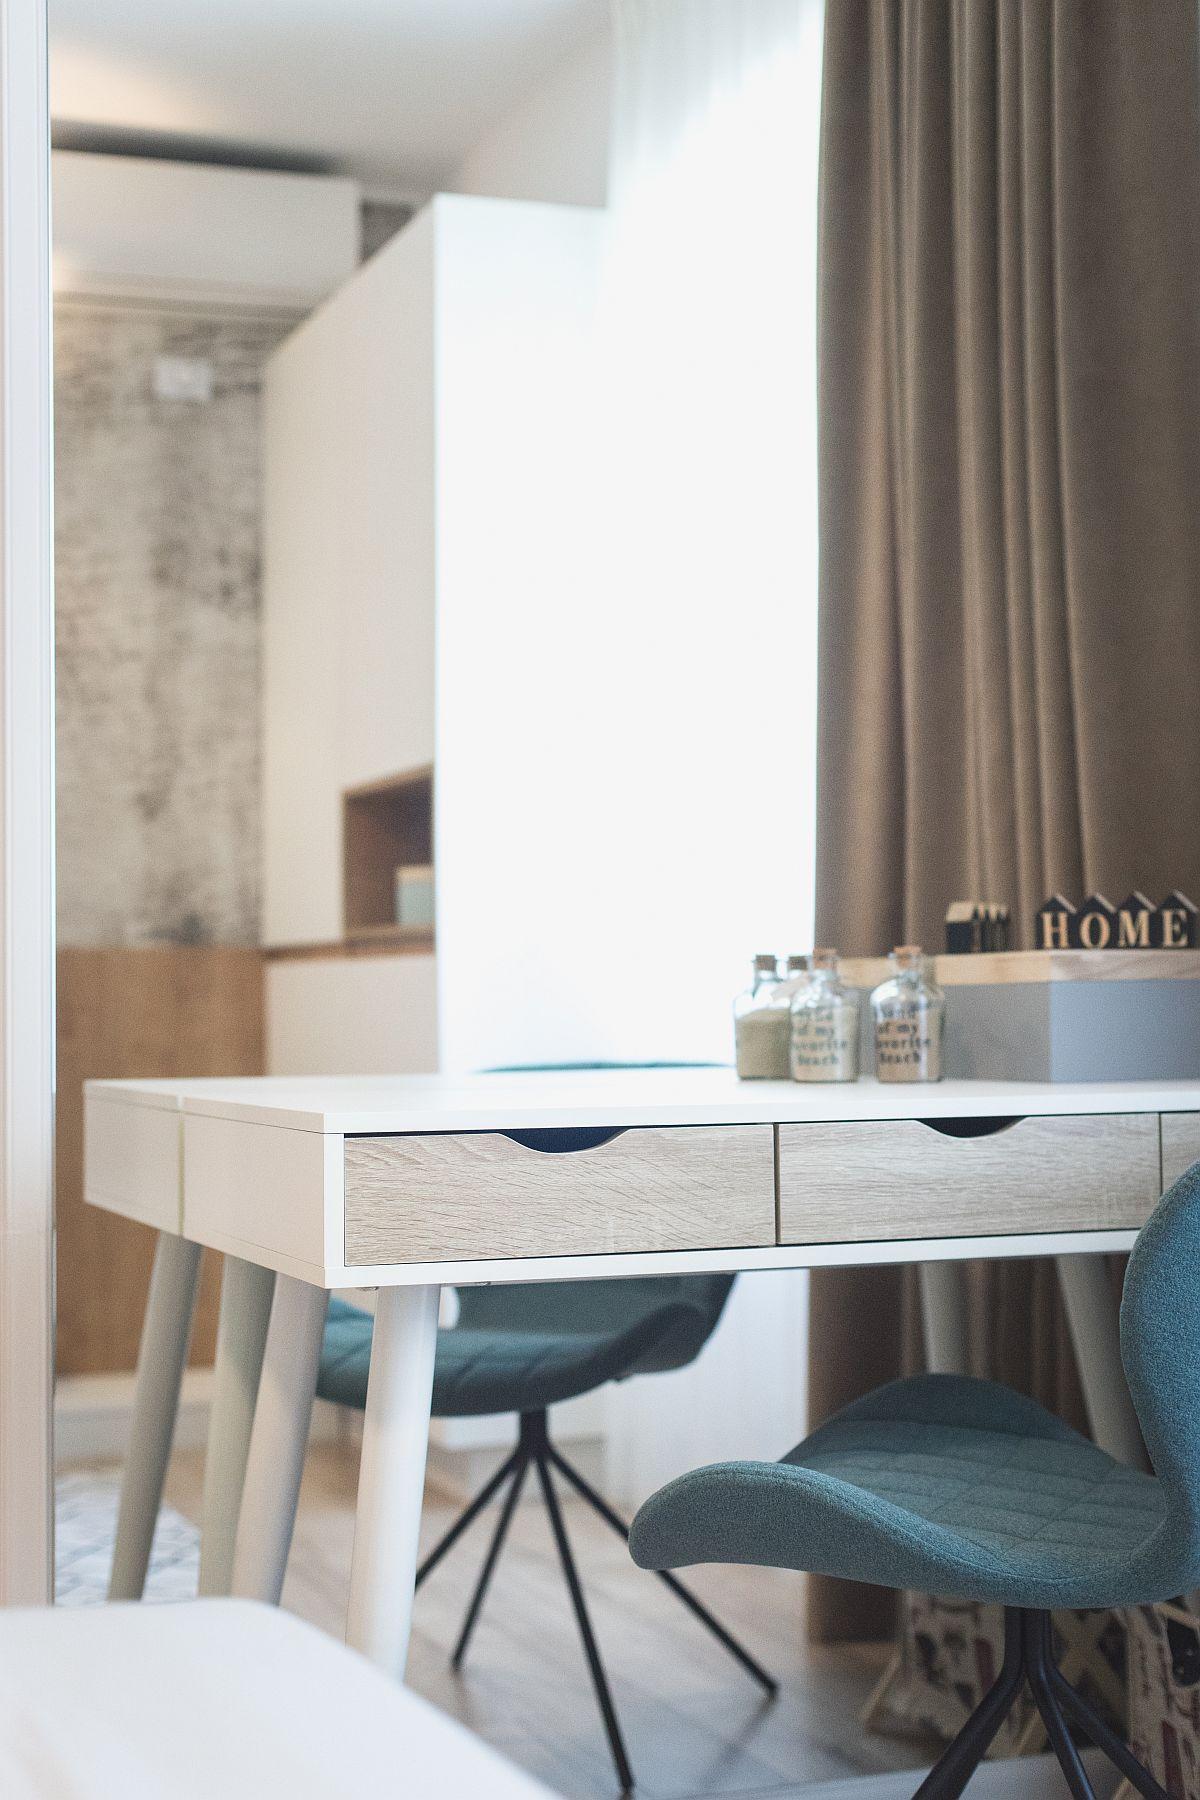 adelaparvu.com despre amenajare apartament 3 camere Bucuresti, designer Cristina Micu (6)